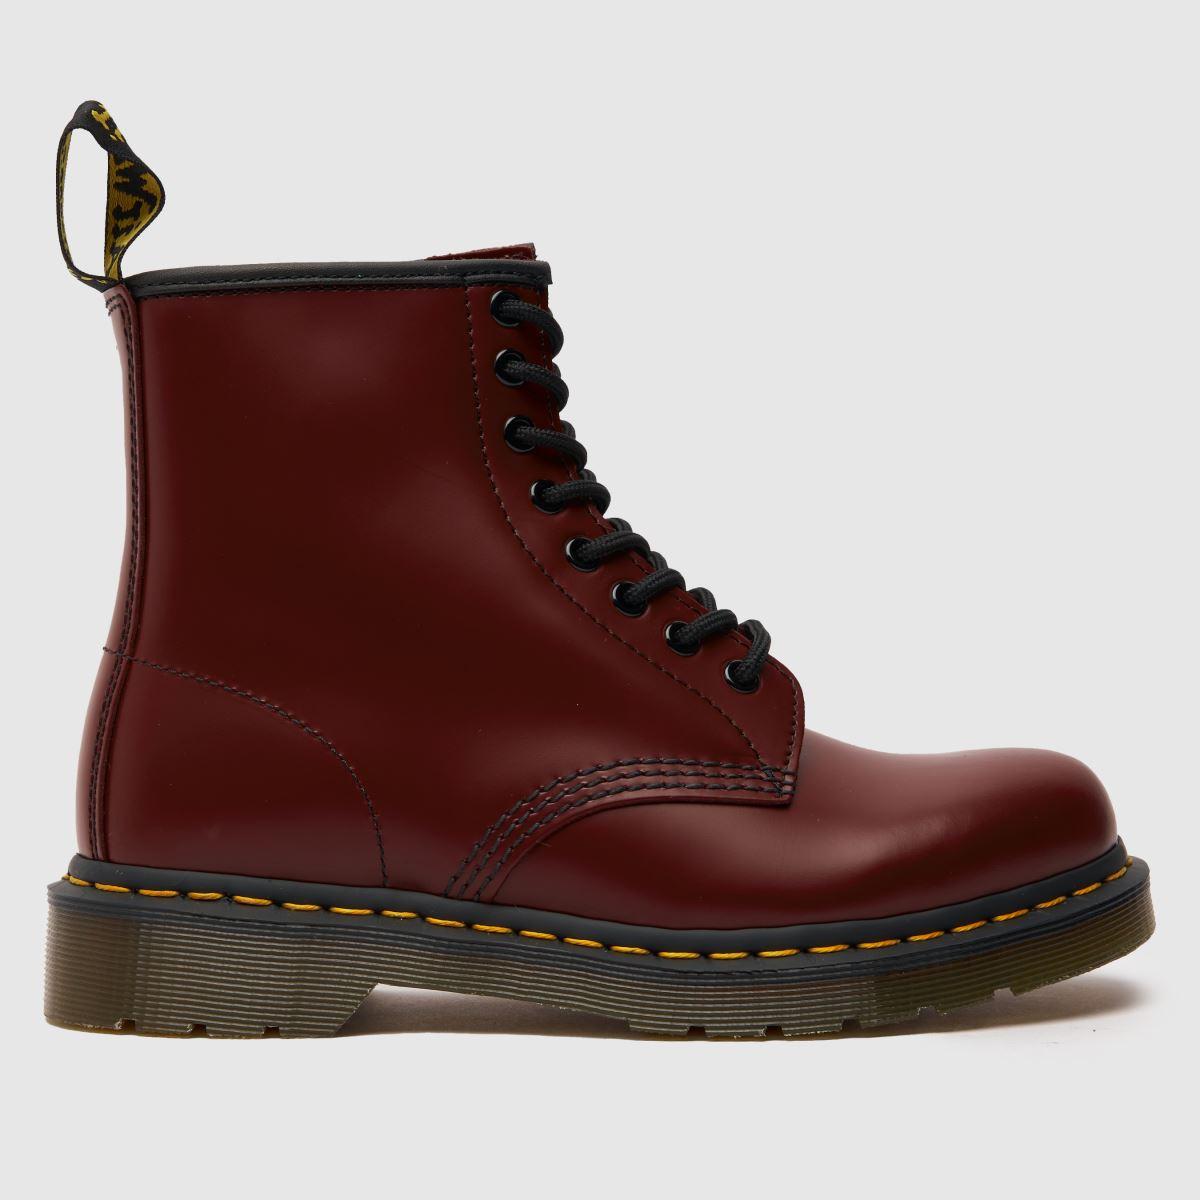 Dr Martens Burgundy 1460 8 Eye Boot Boots